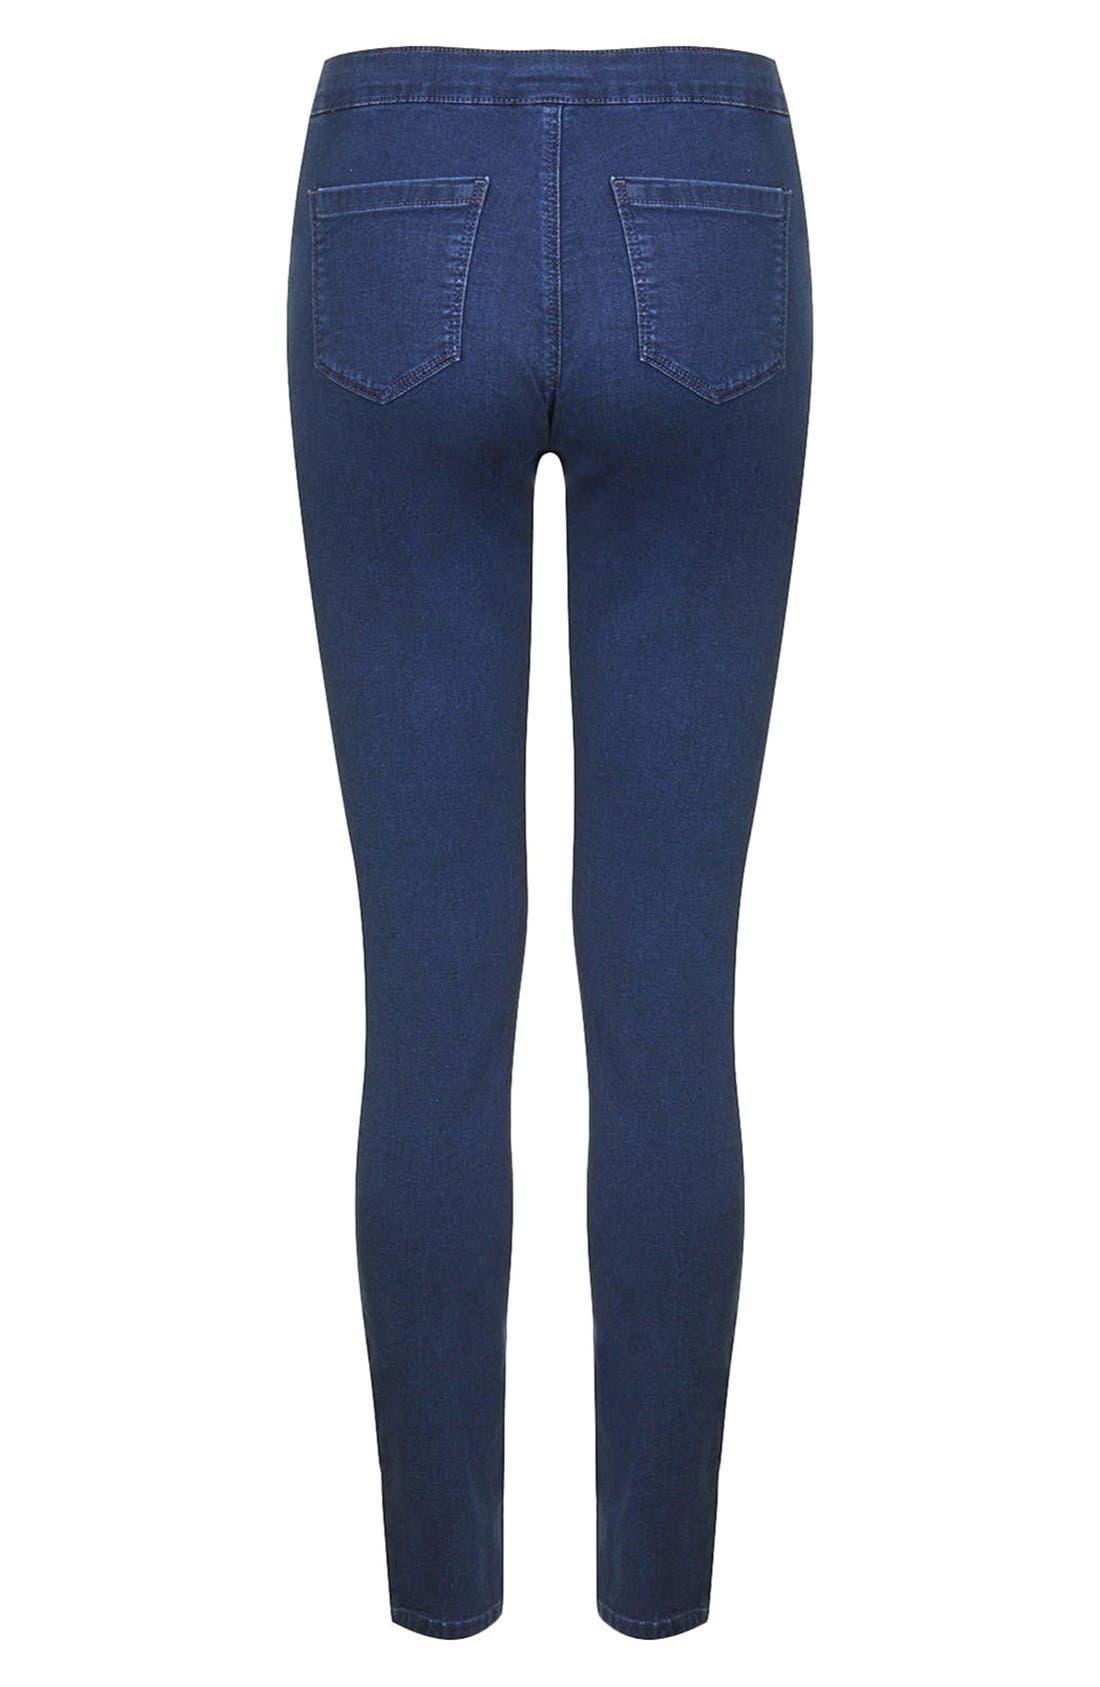 Alternate Image 2  - Topshop Maternity Skinny Moto Jeans